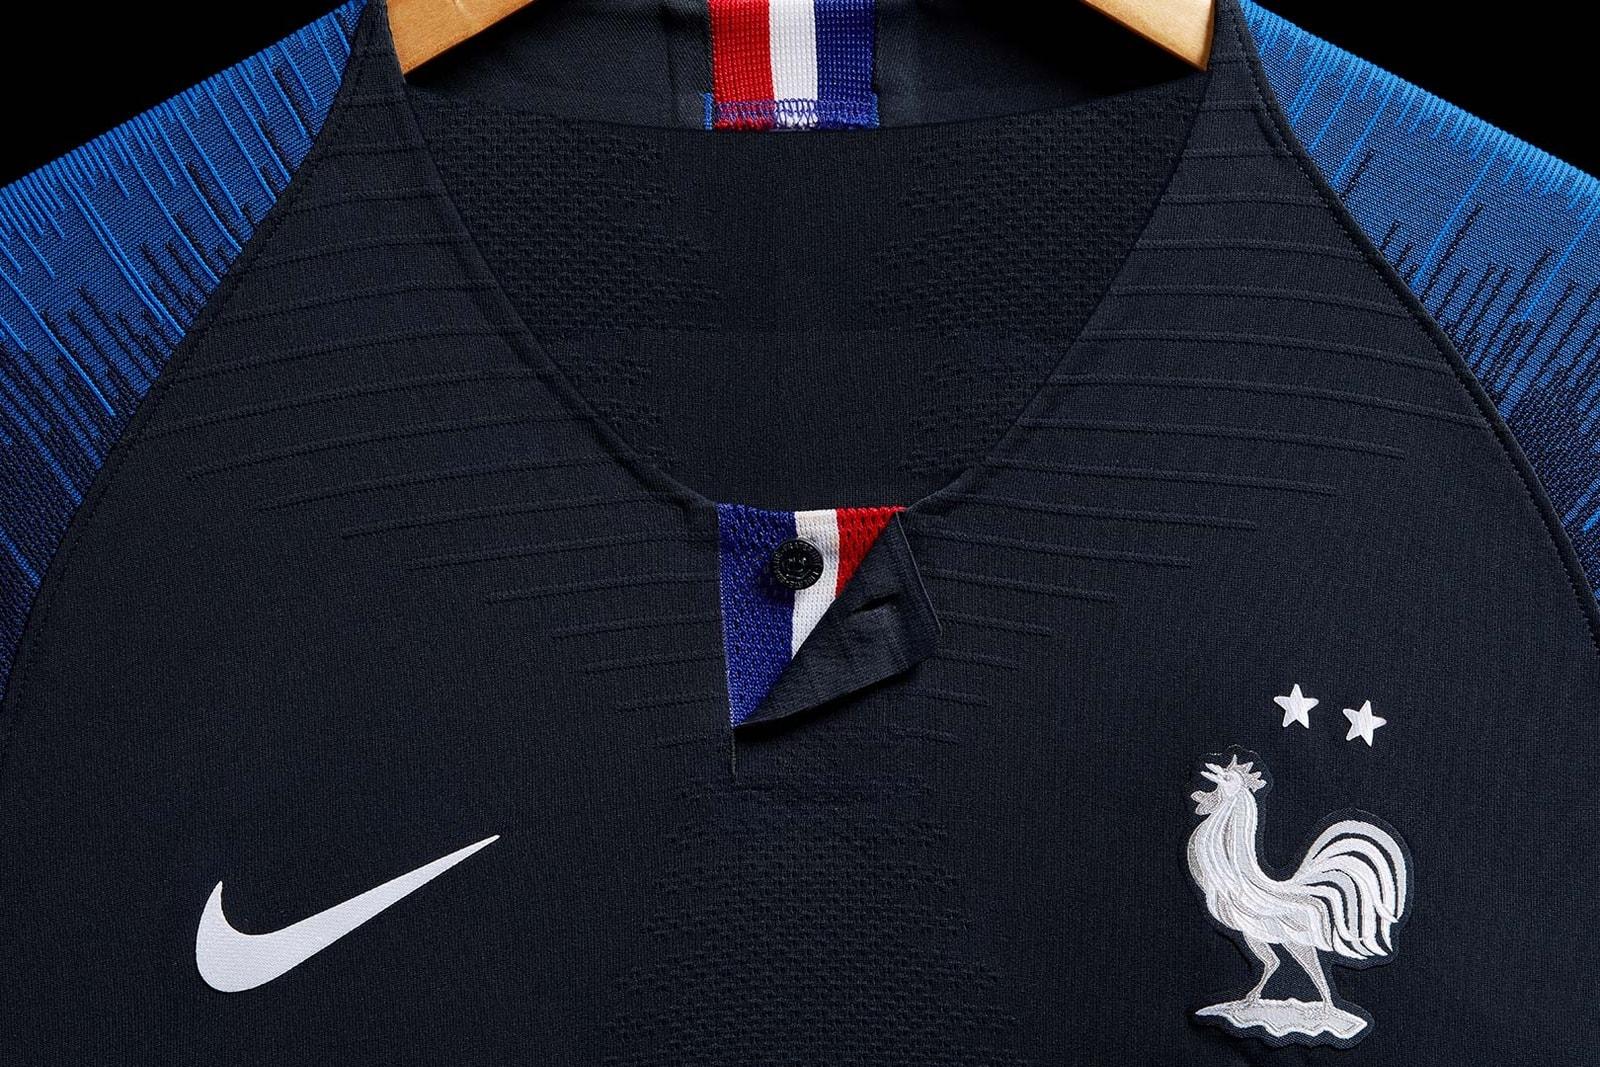 Nike adidas Coupe du Monde 2018 France Sponsors